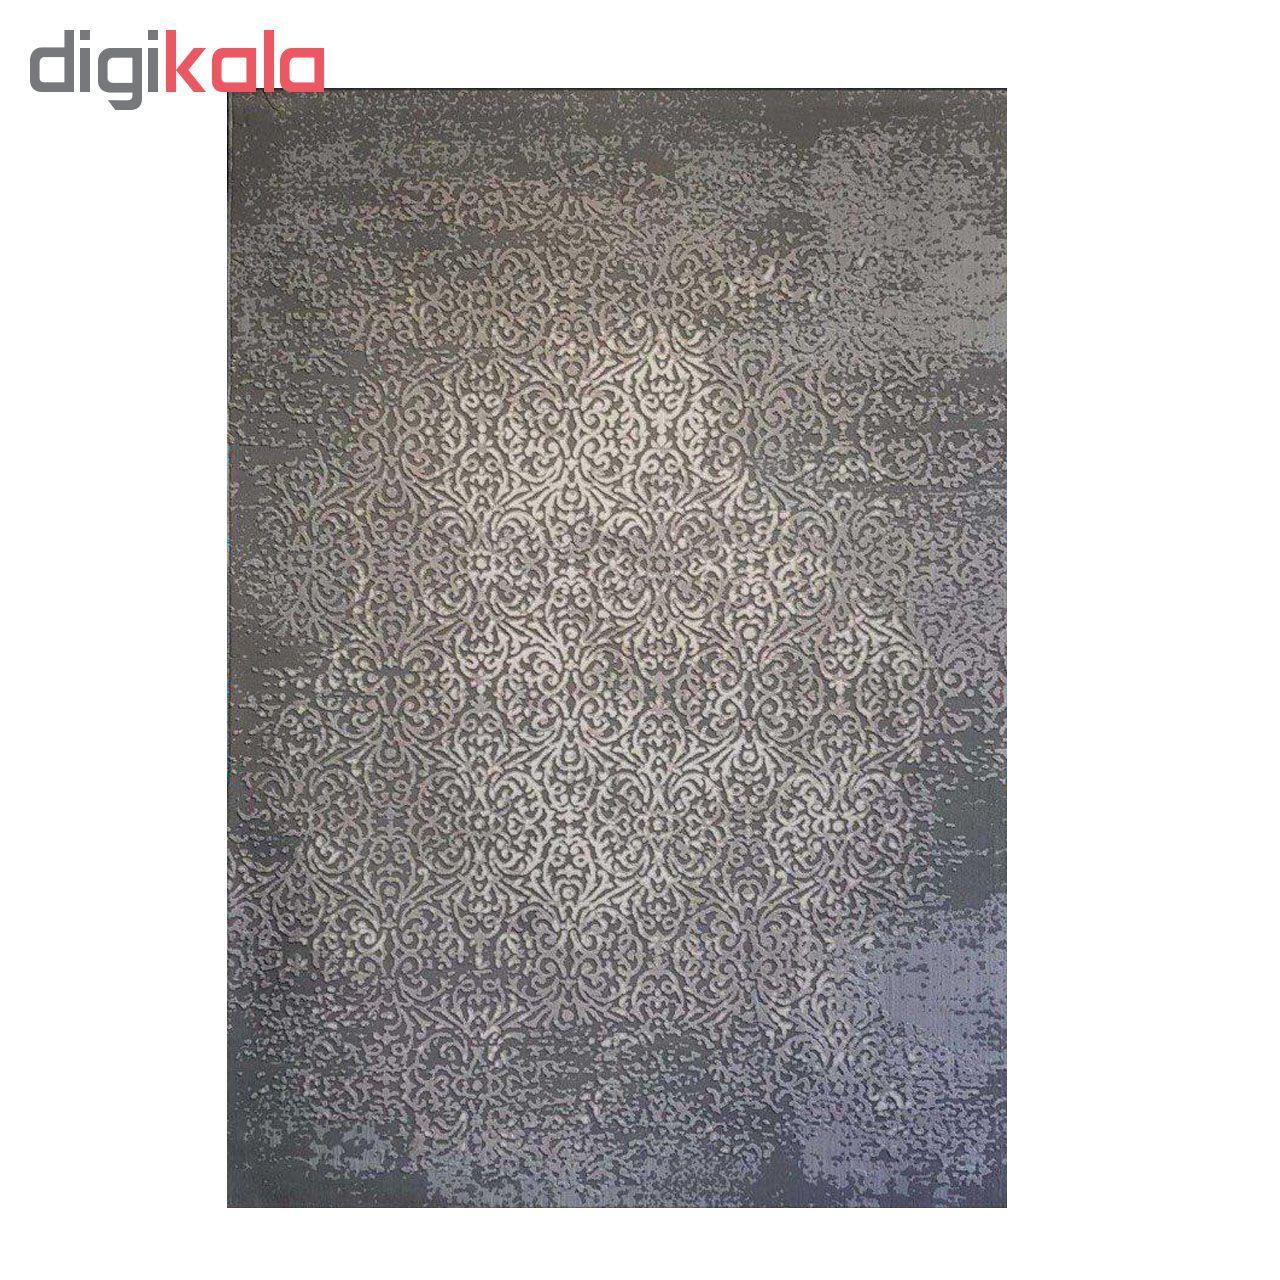 فرش ماشینی طرح پلاتینیوم کد 5001 زمینه طوسی  main 1 1